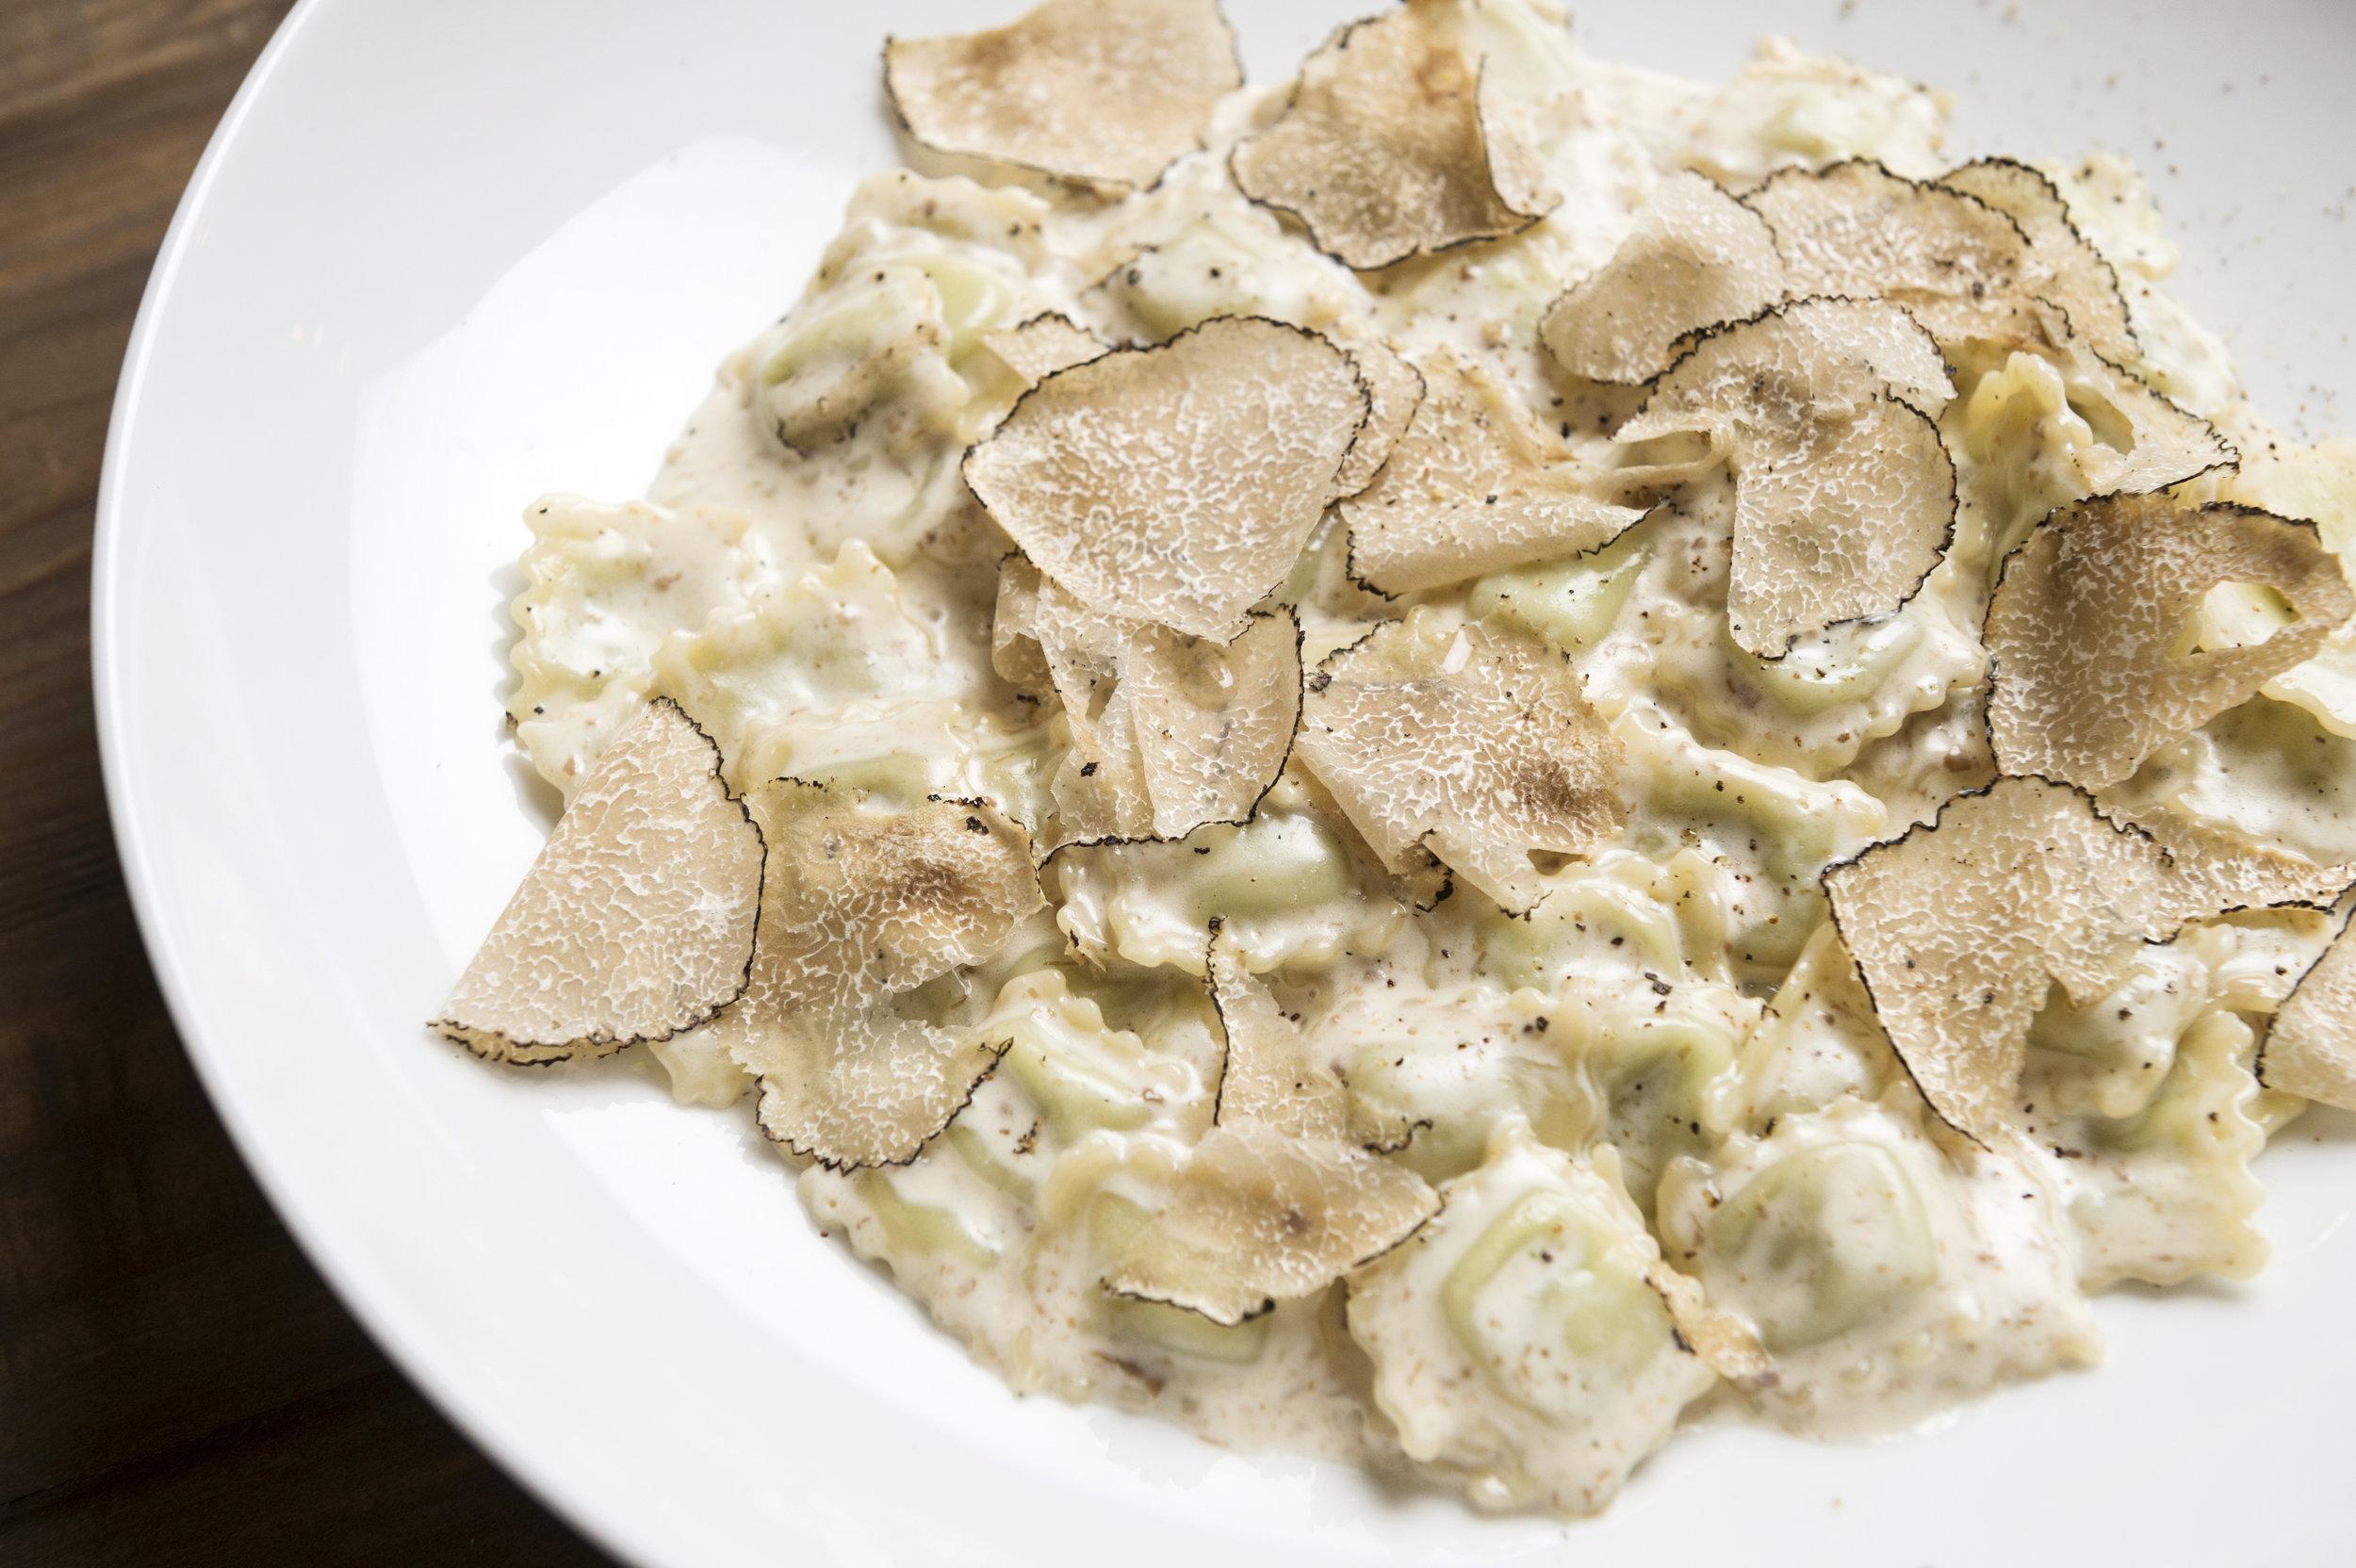 Raviolini with truffles